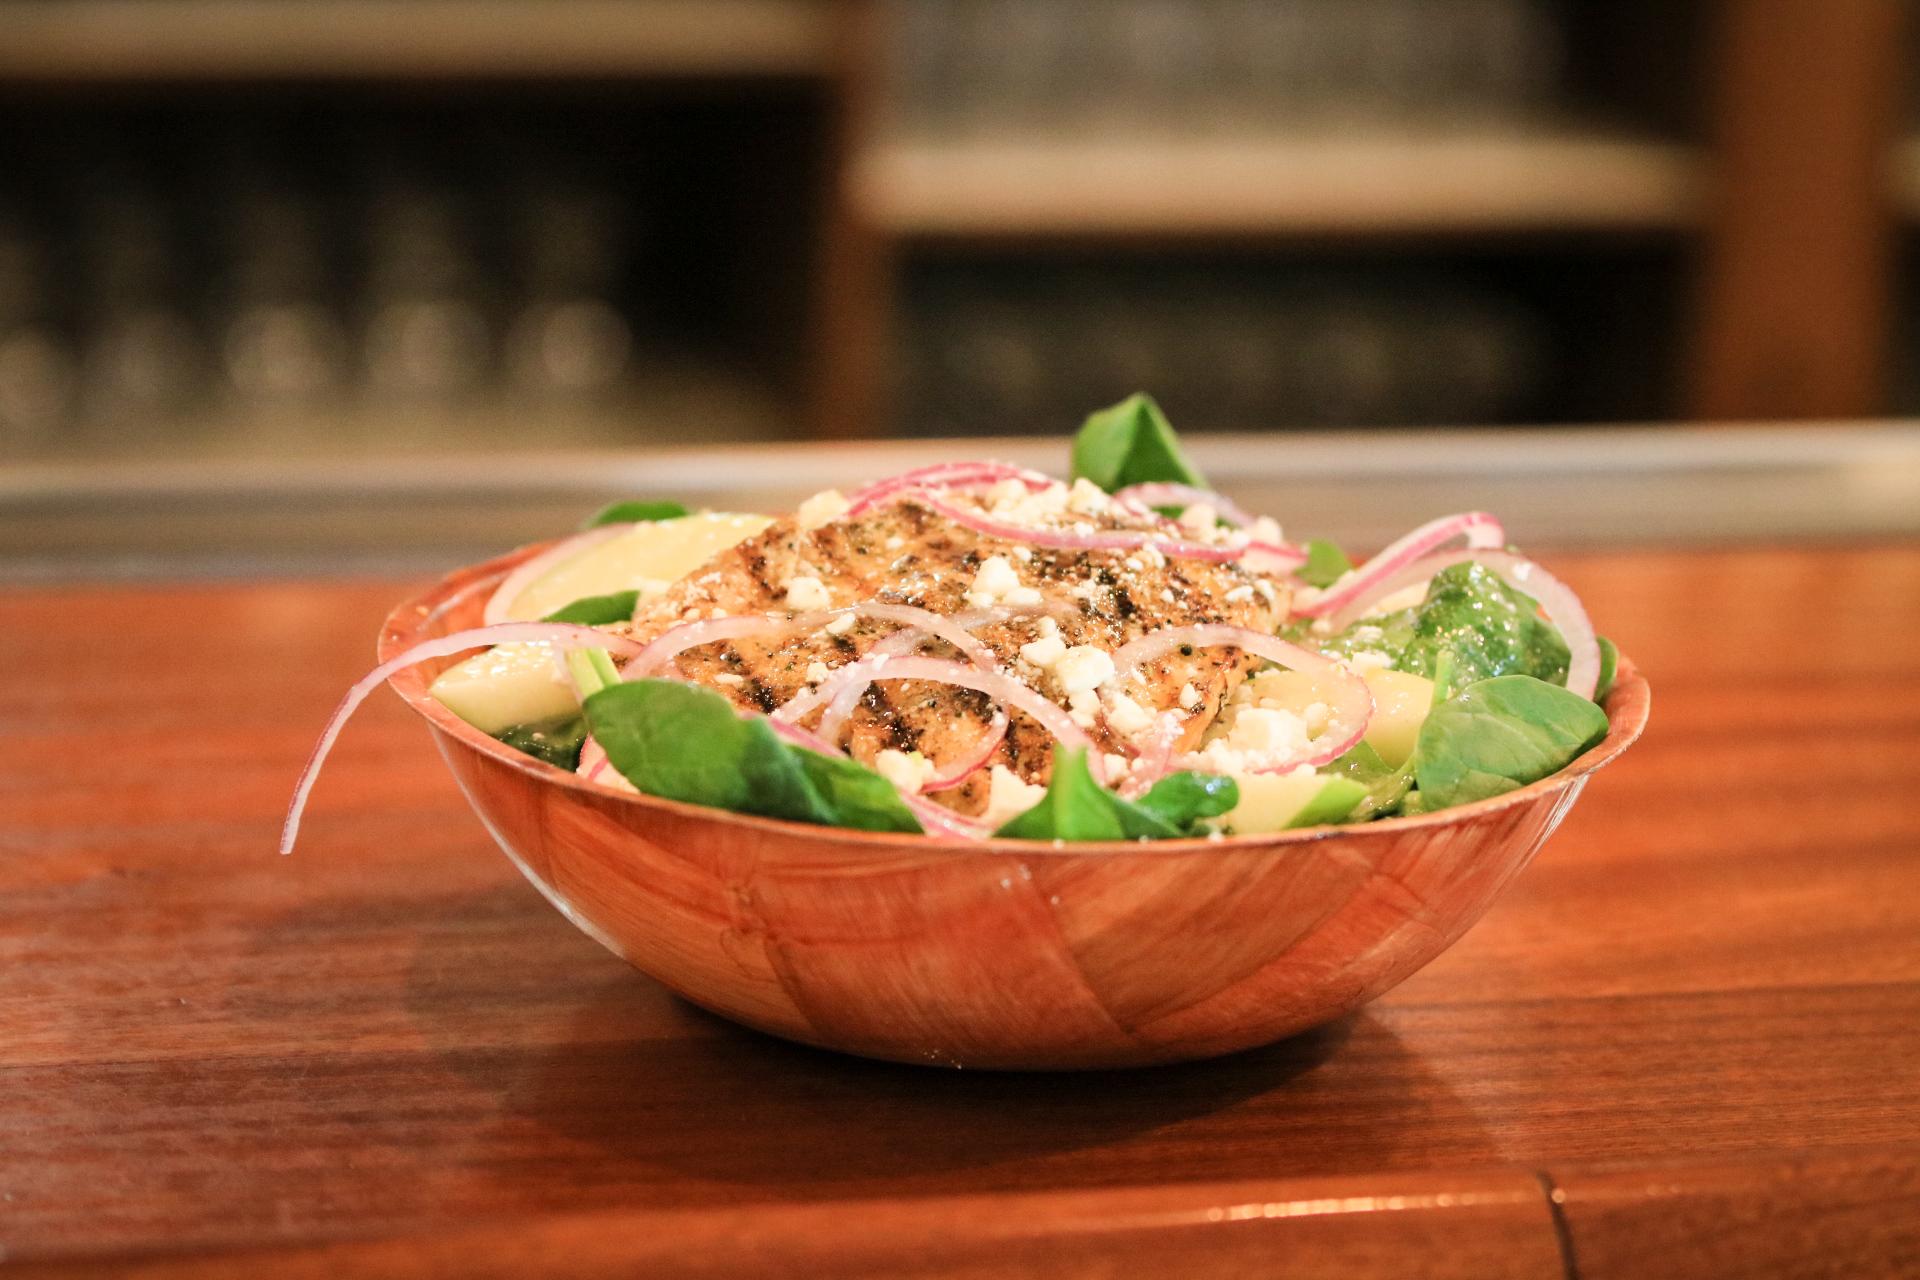 woodys-pub-salad.jpg